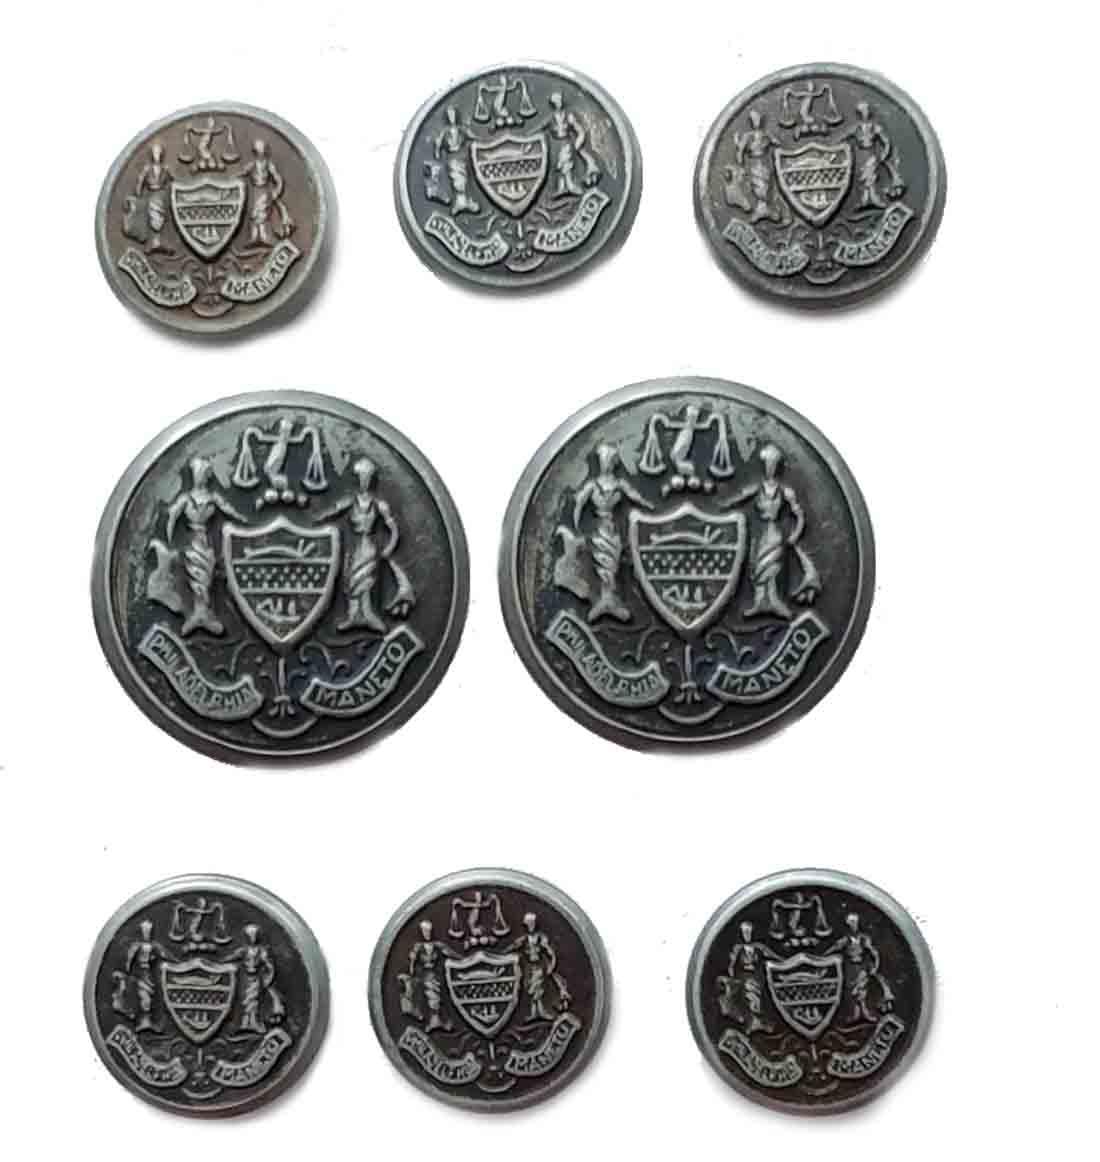 Vintage Ball & Docket Philadelphia Maneto Seal Blazer Buttons Set Gray Metal Men's